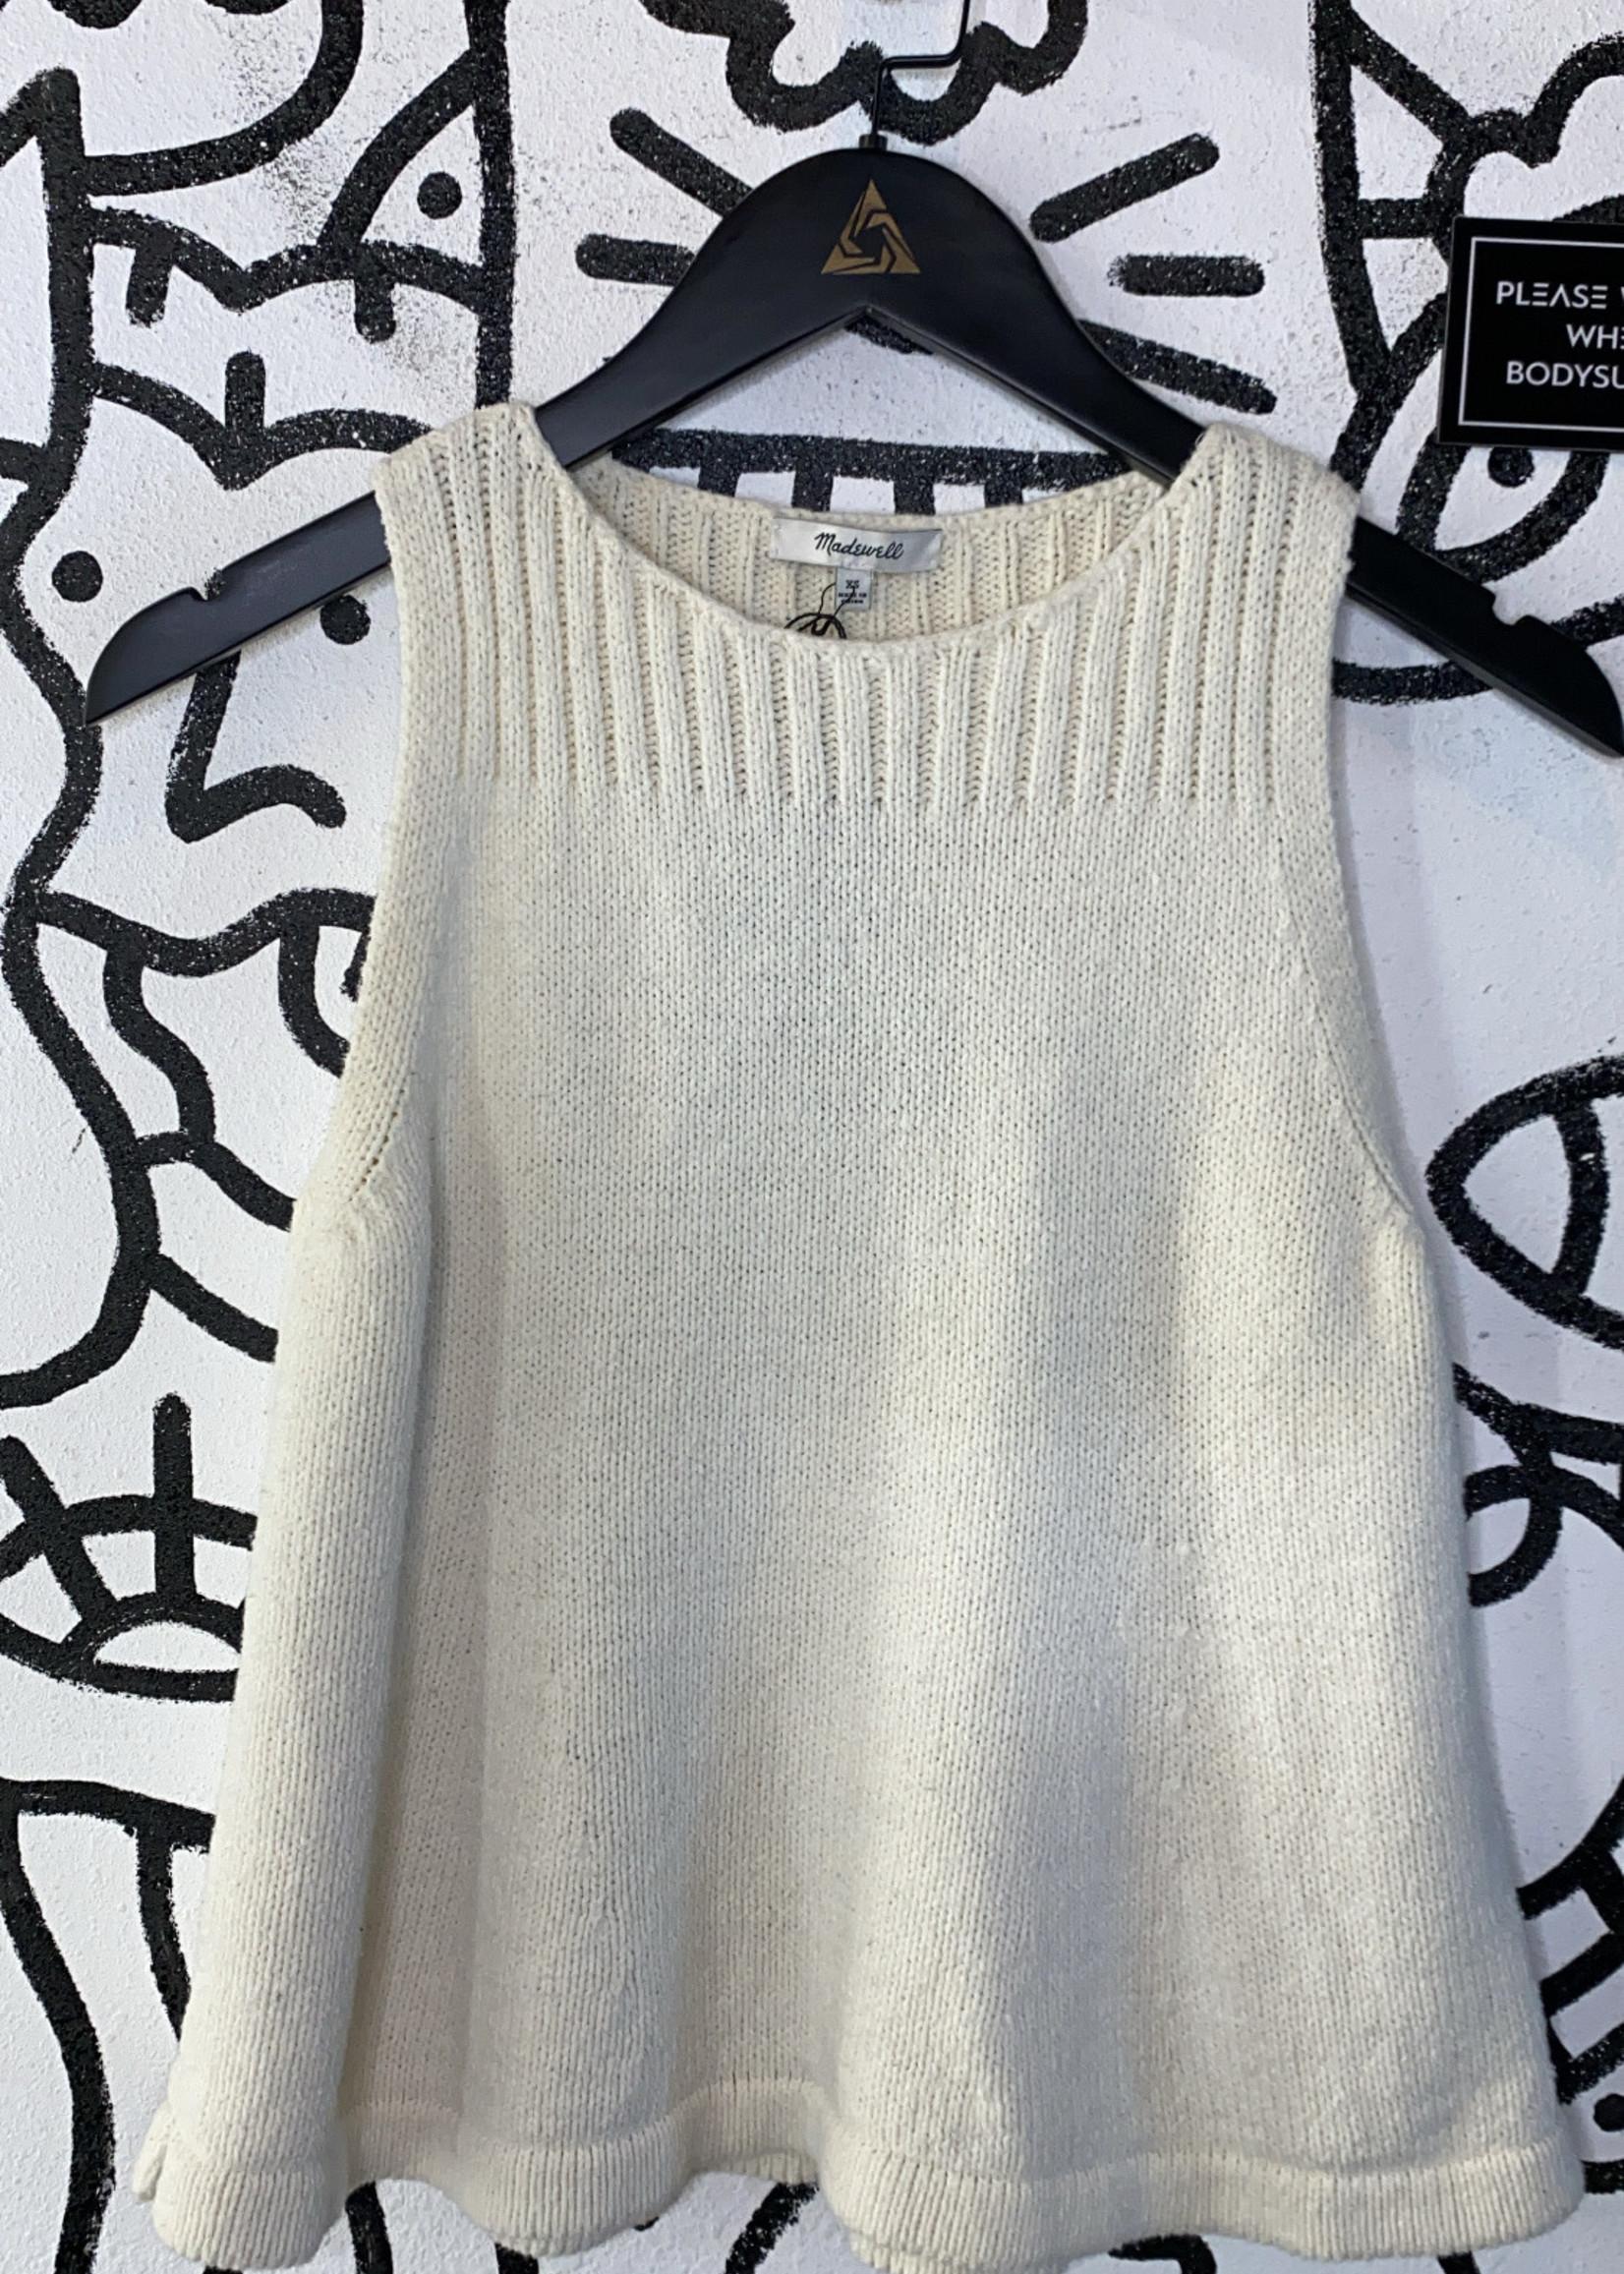 Madewell off white crochet sleeveless top XS